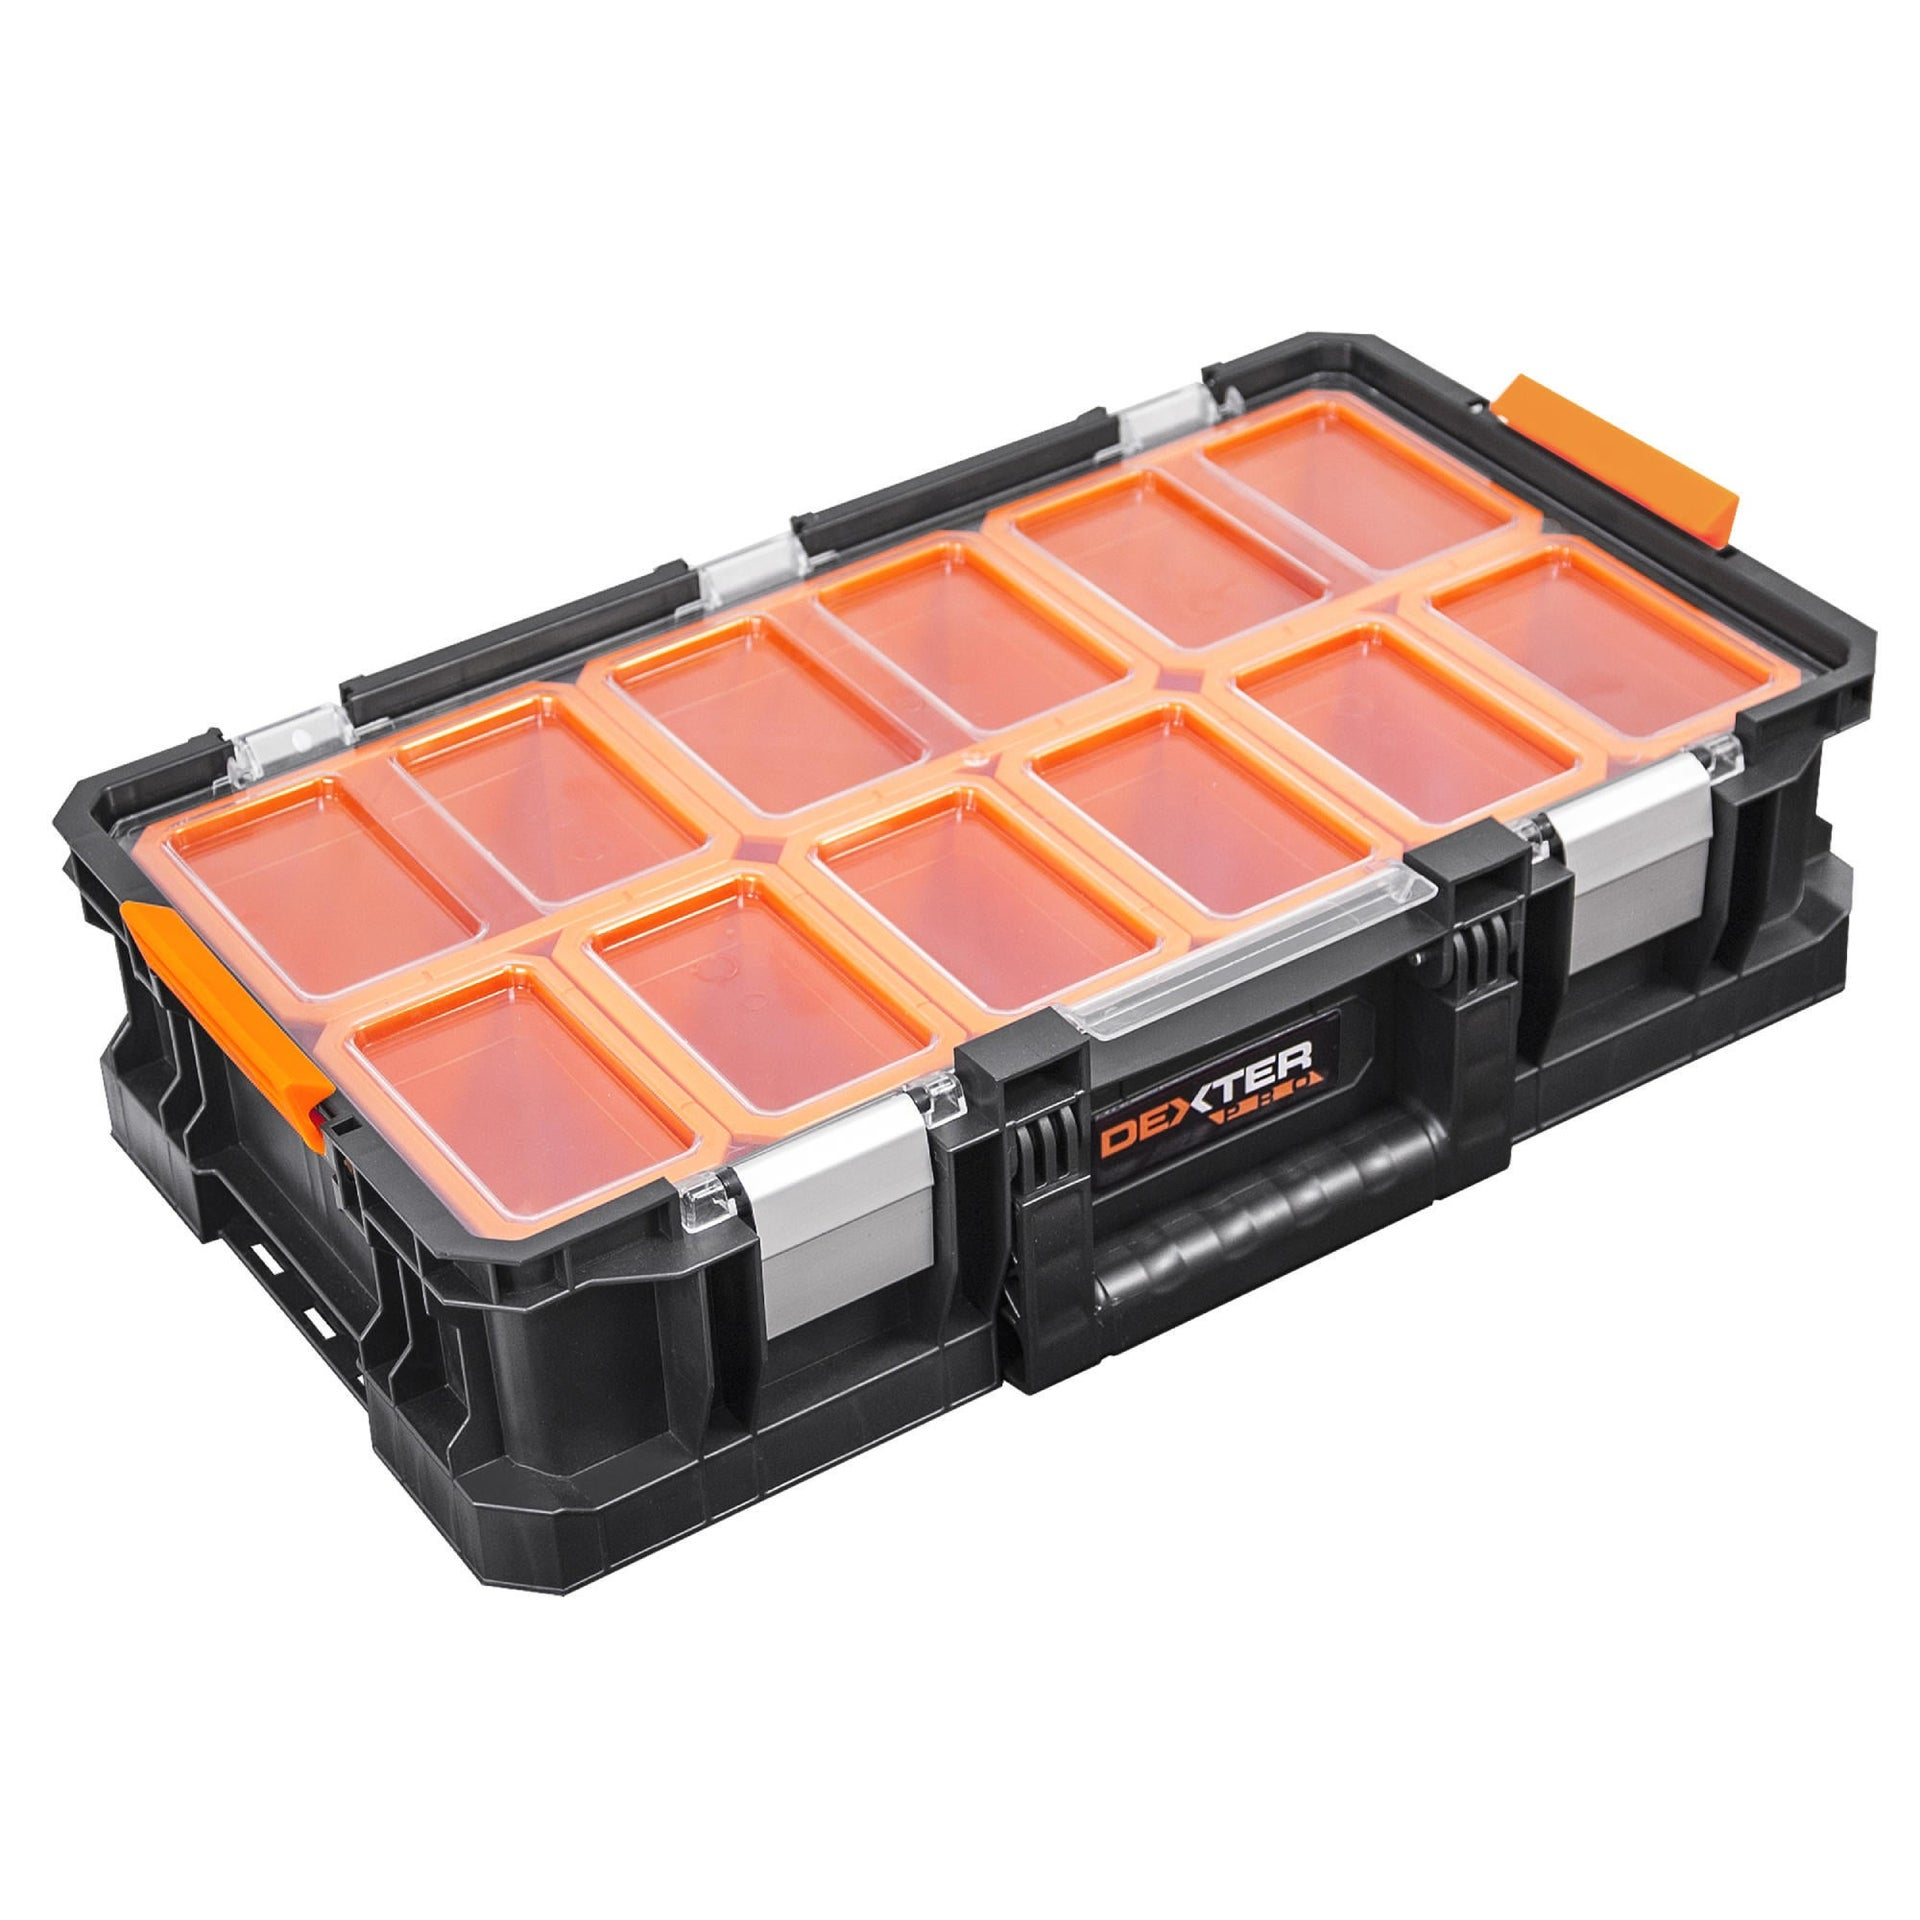 Cassetta attrezzi DEXTER PRO L 31.1 x H 13.2 cm, profondità 546 mm - 2